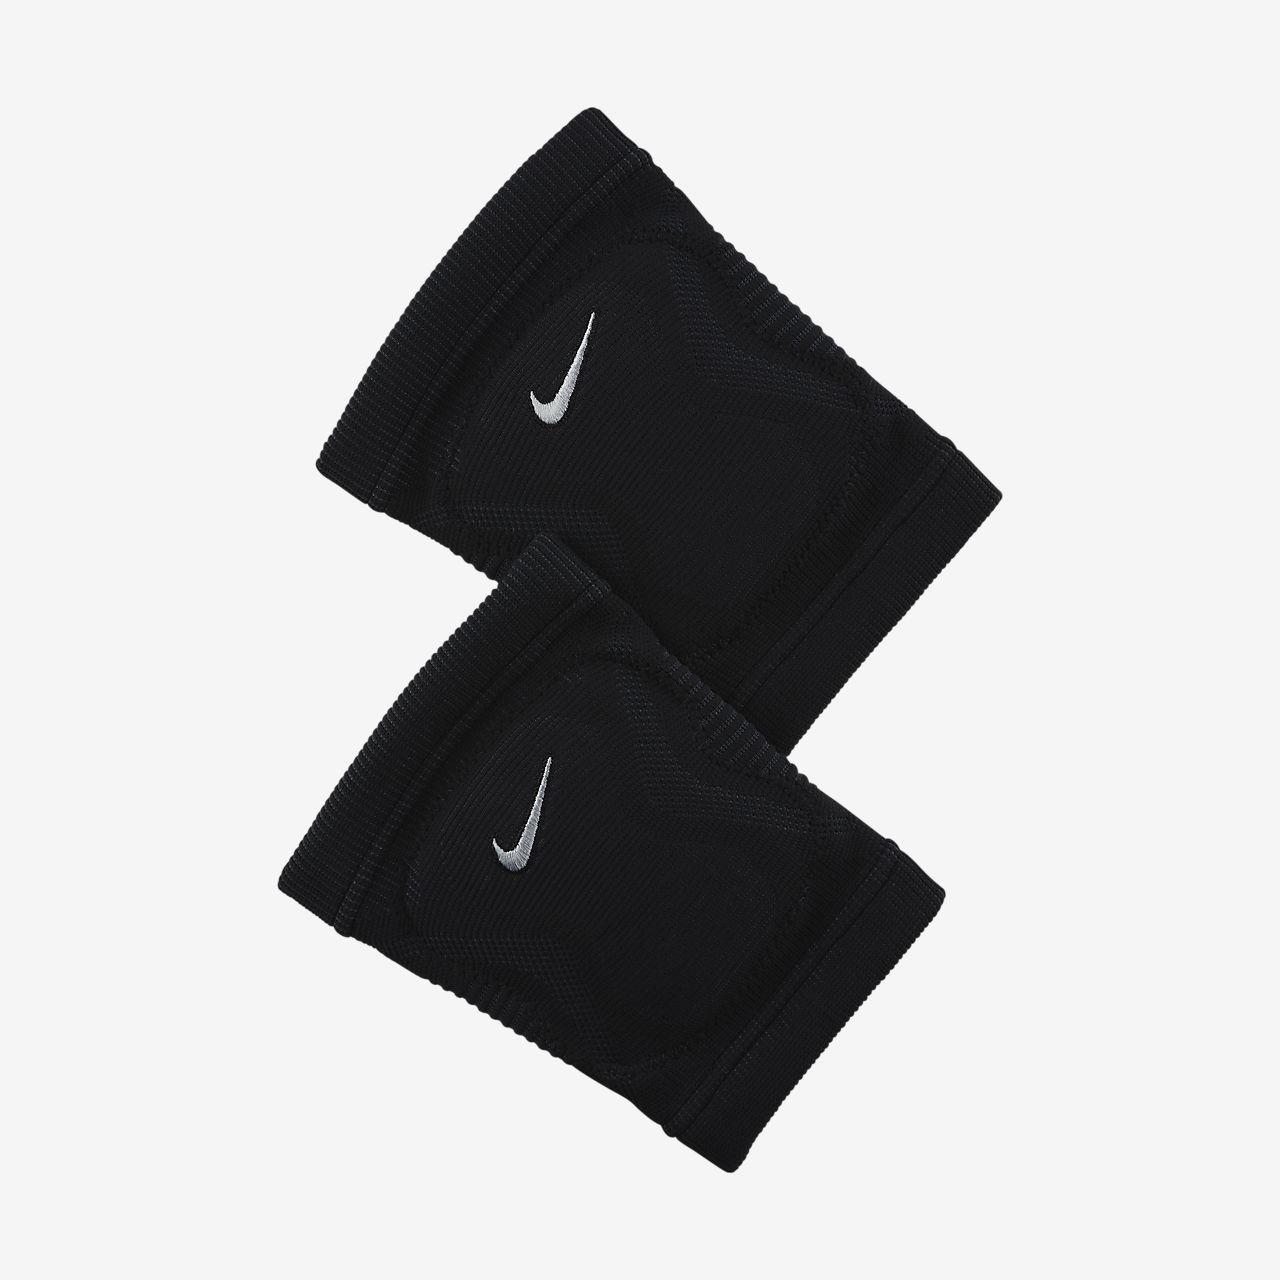 Nike Vapor Volleyball Knee Pads